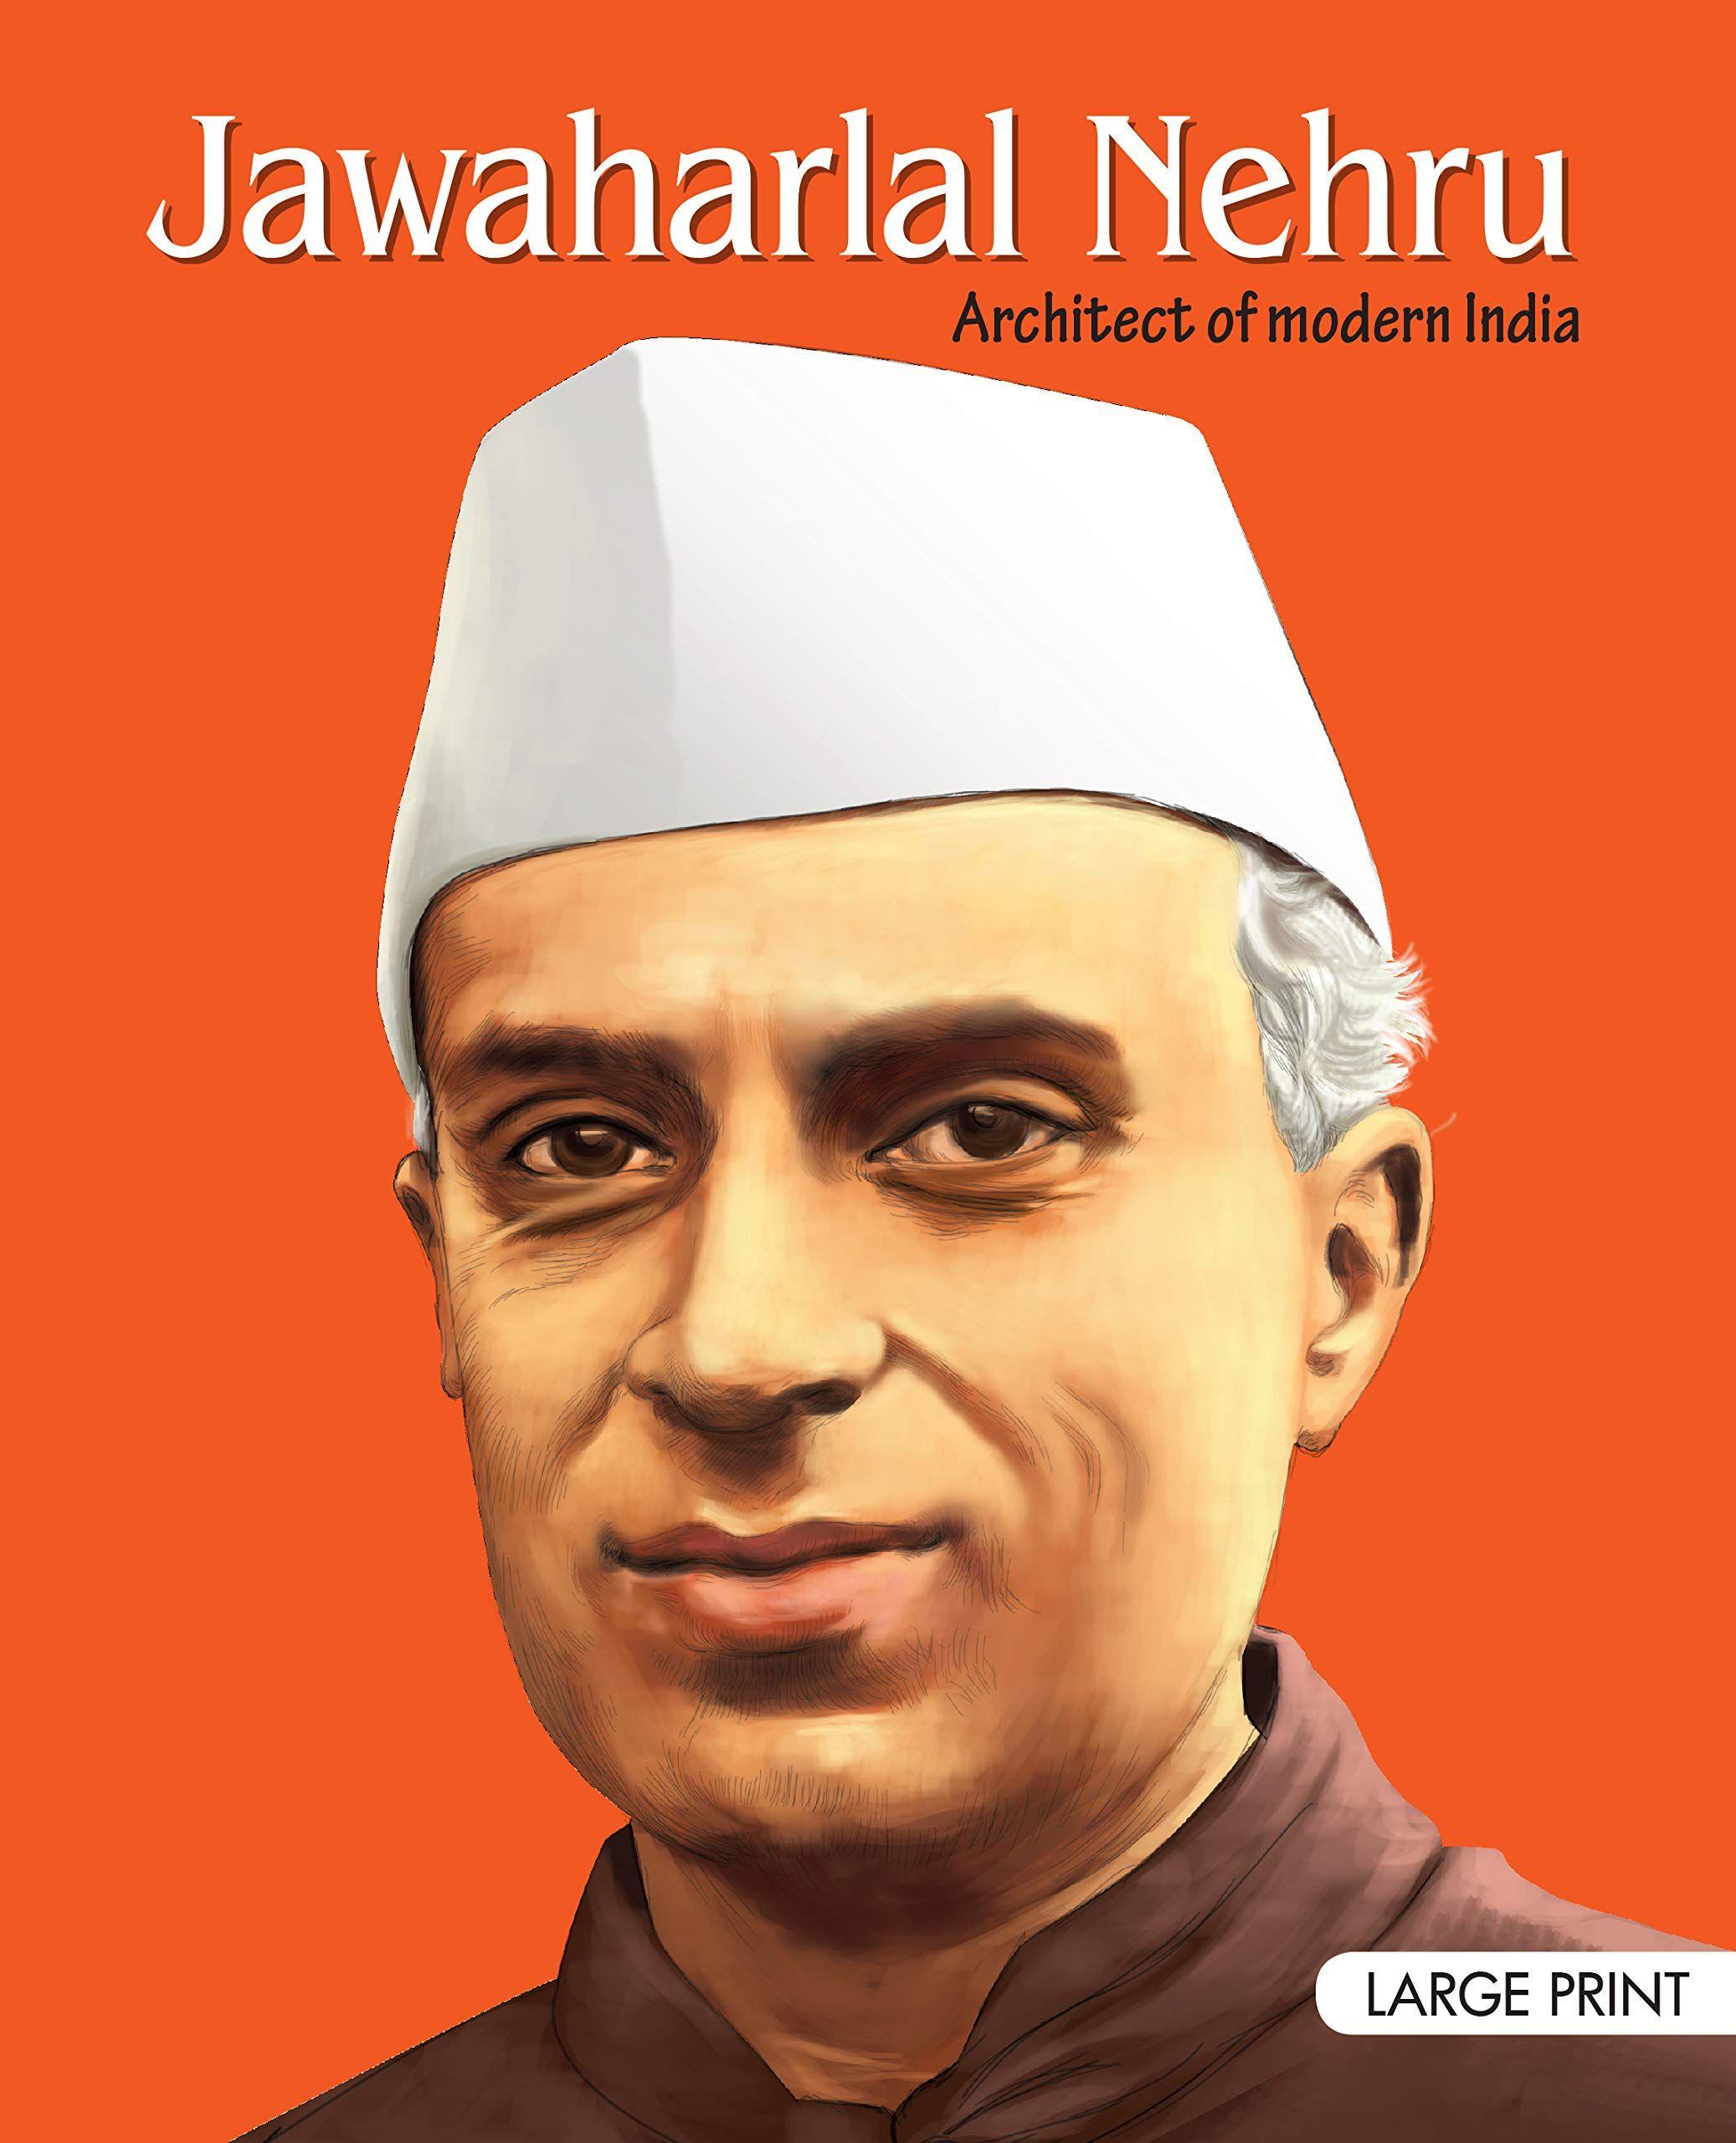 English Essay On Jawaharlal Nehru in Simple English